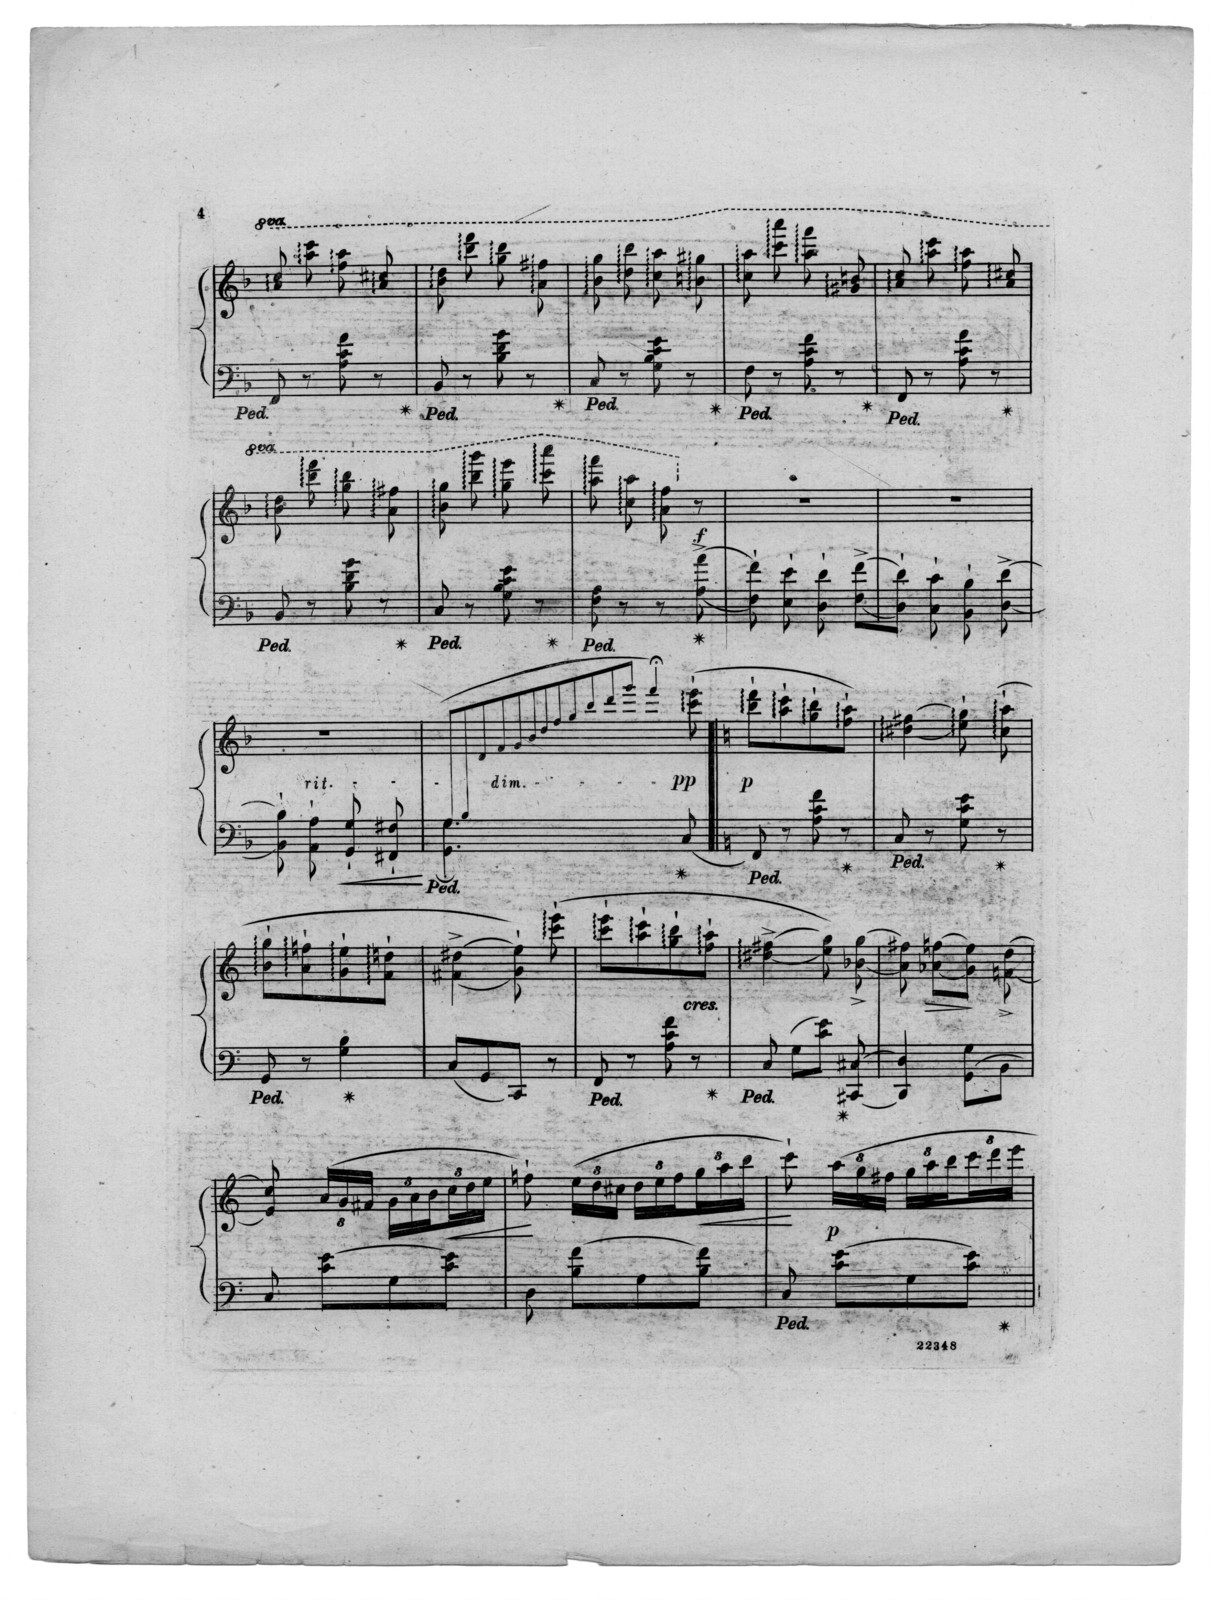 May flowers, op. 6, no. 4